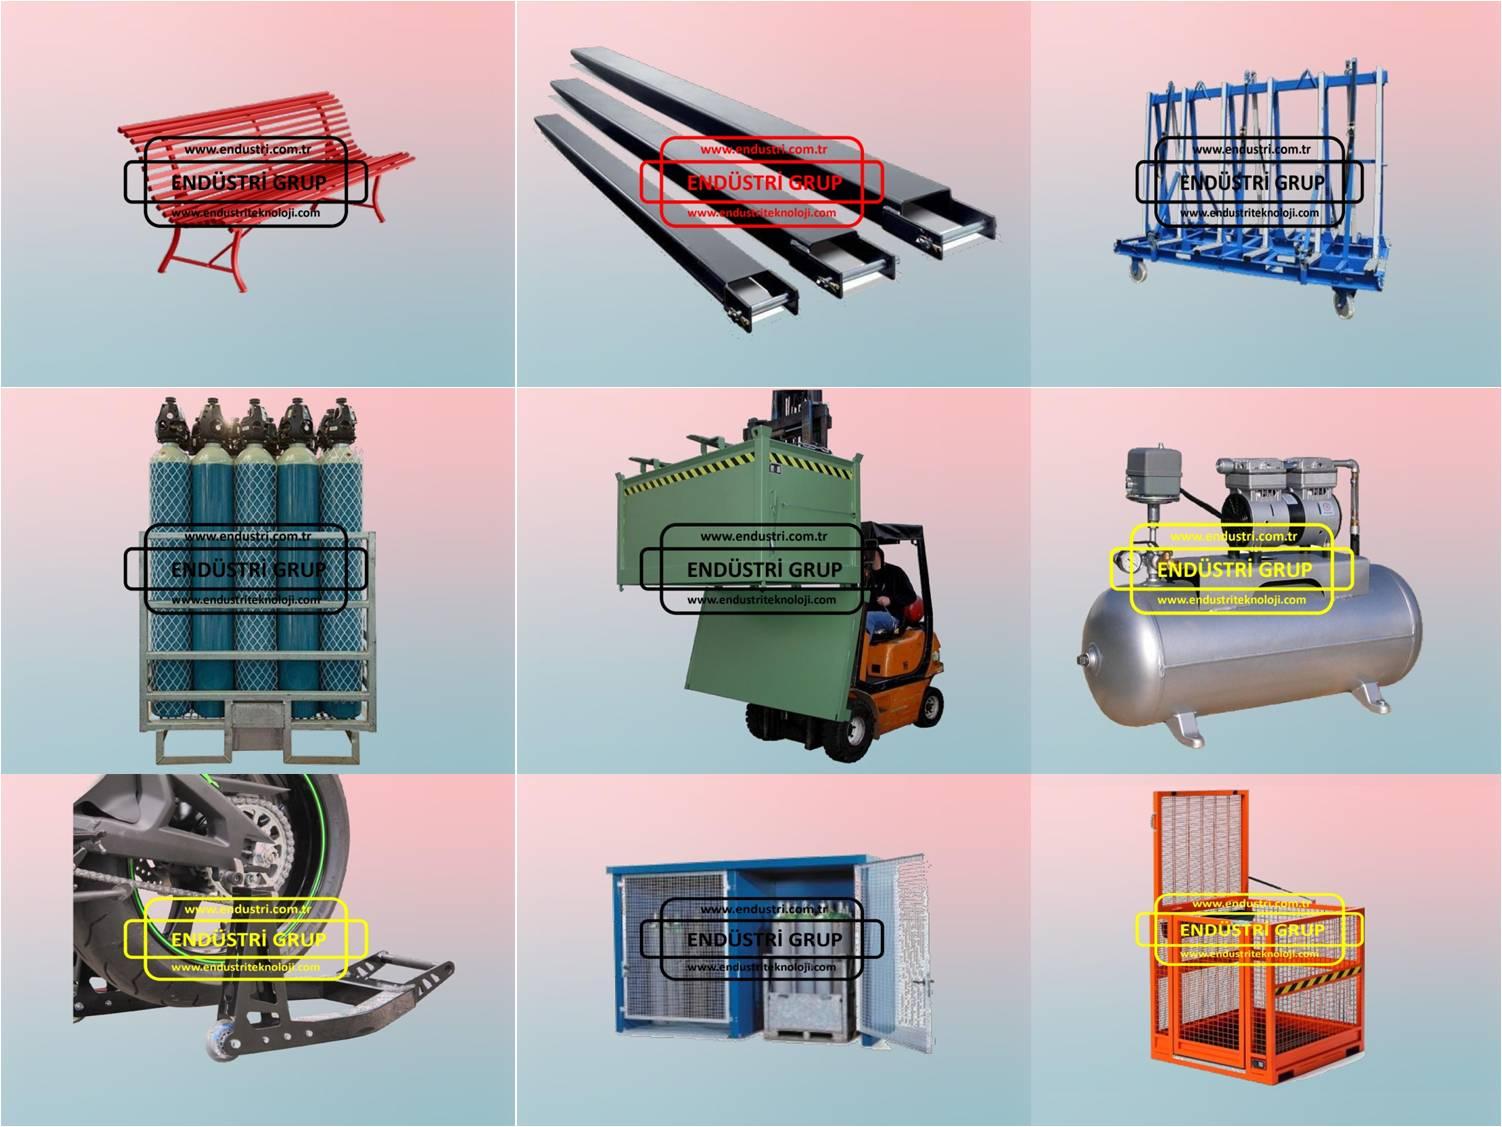 insaat-santiye-donanimlari-muhendislik-hizmeti-makina-urunleri-galvaniz-kaplama-yapi-ekipmani-imalati